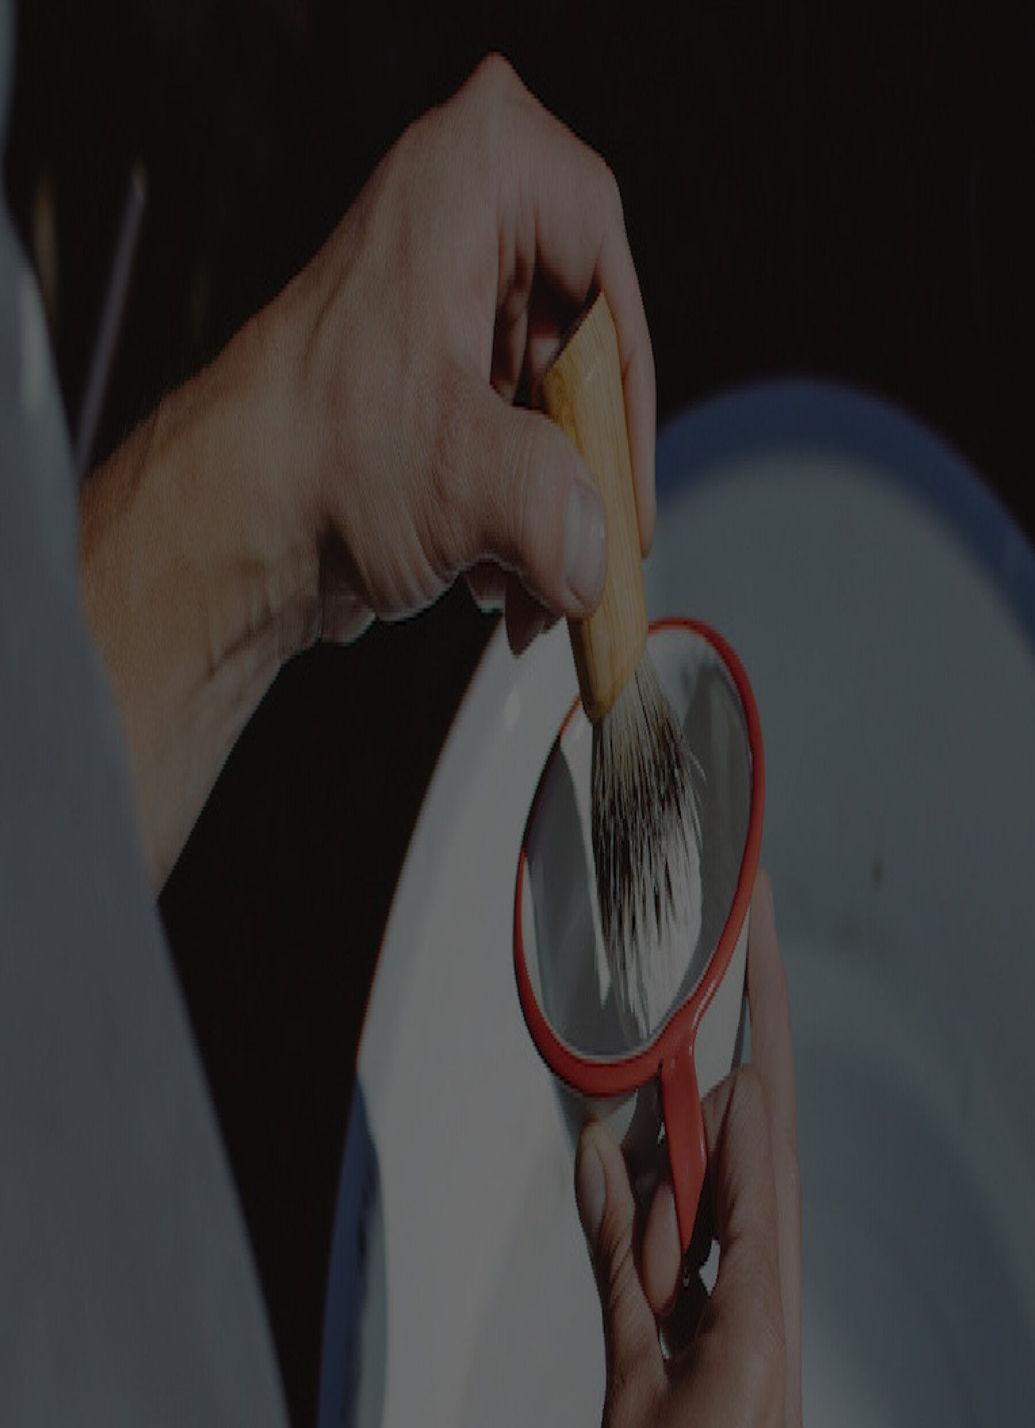 A hand dipping a shaving brush into shaving cream